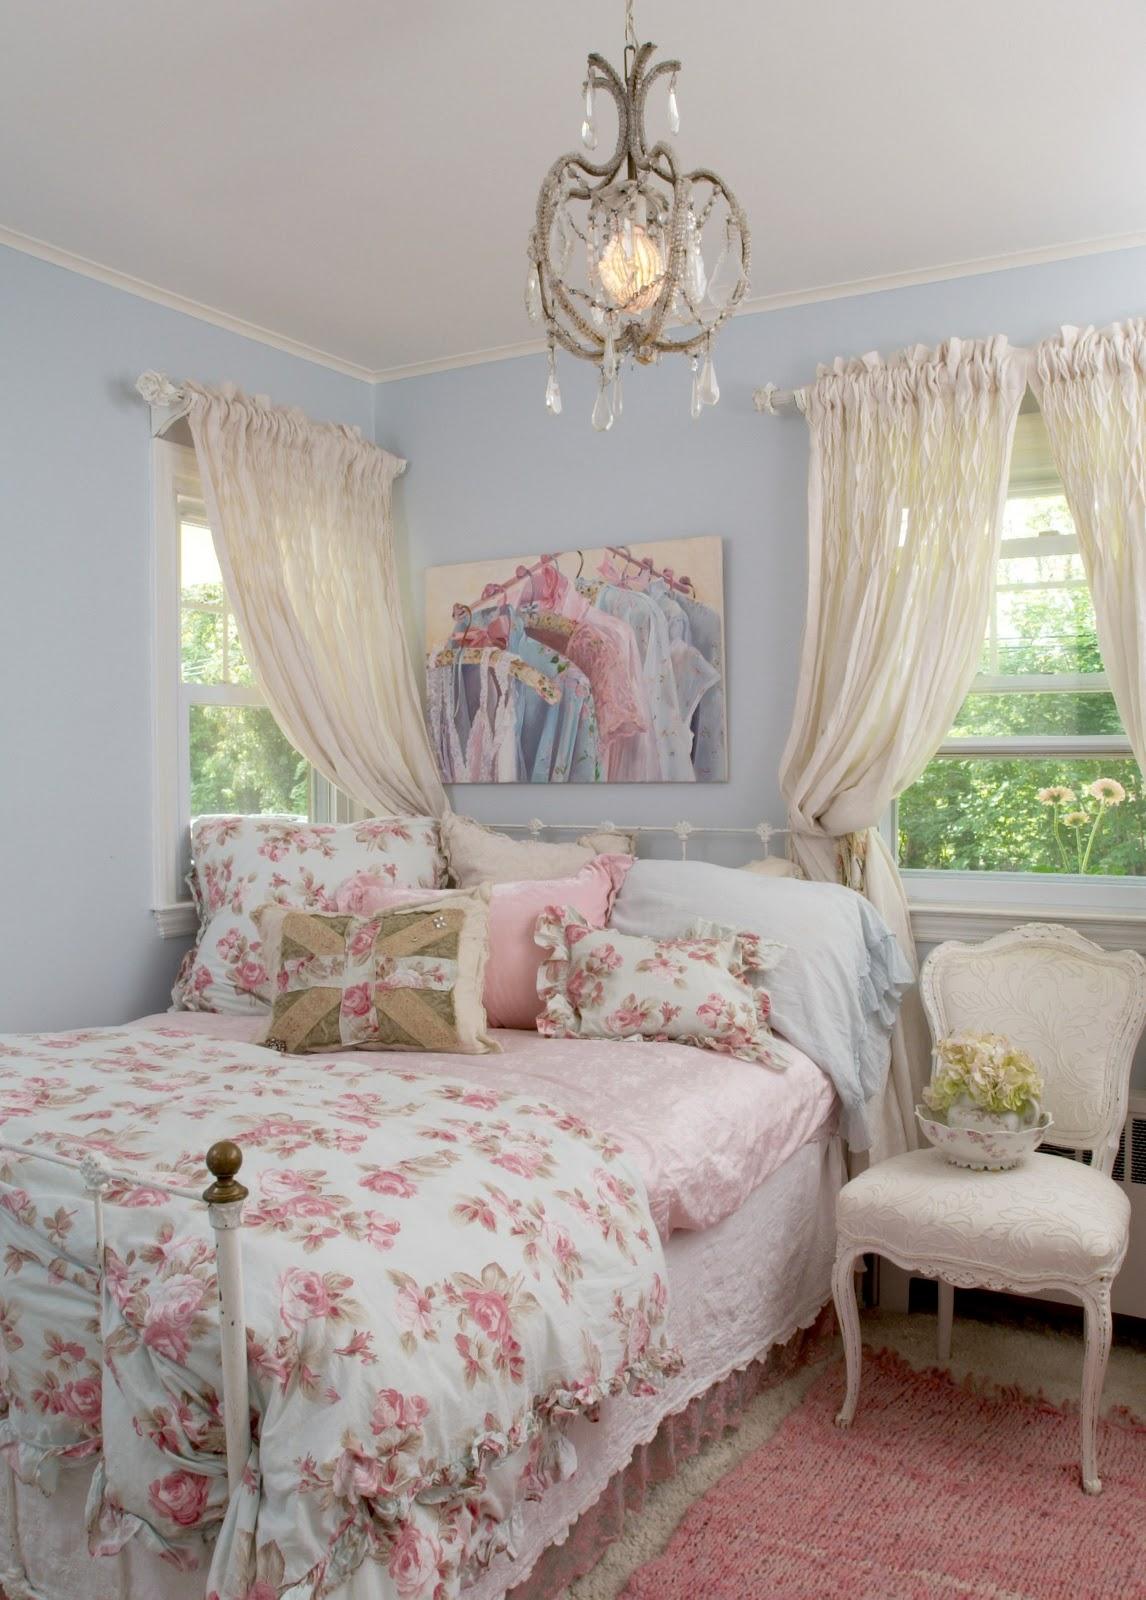 maison decor my shabby bedroom makeover plan On shabby bedroom